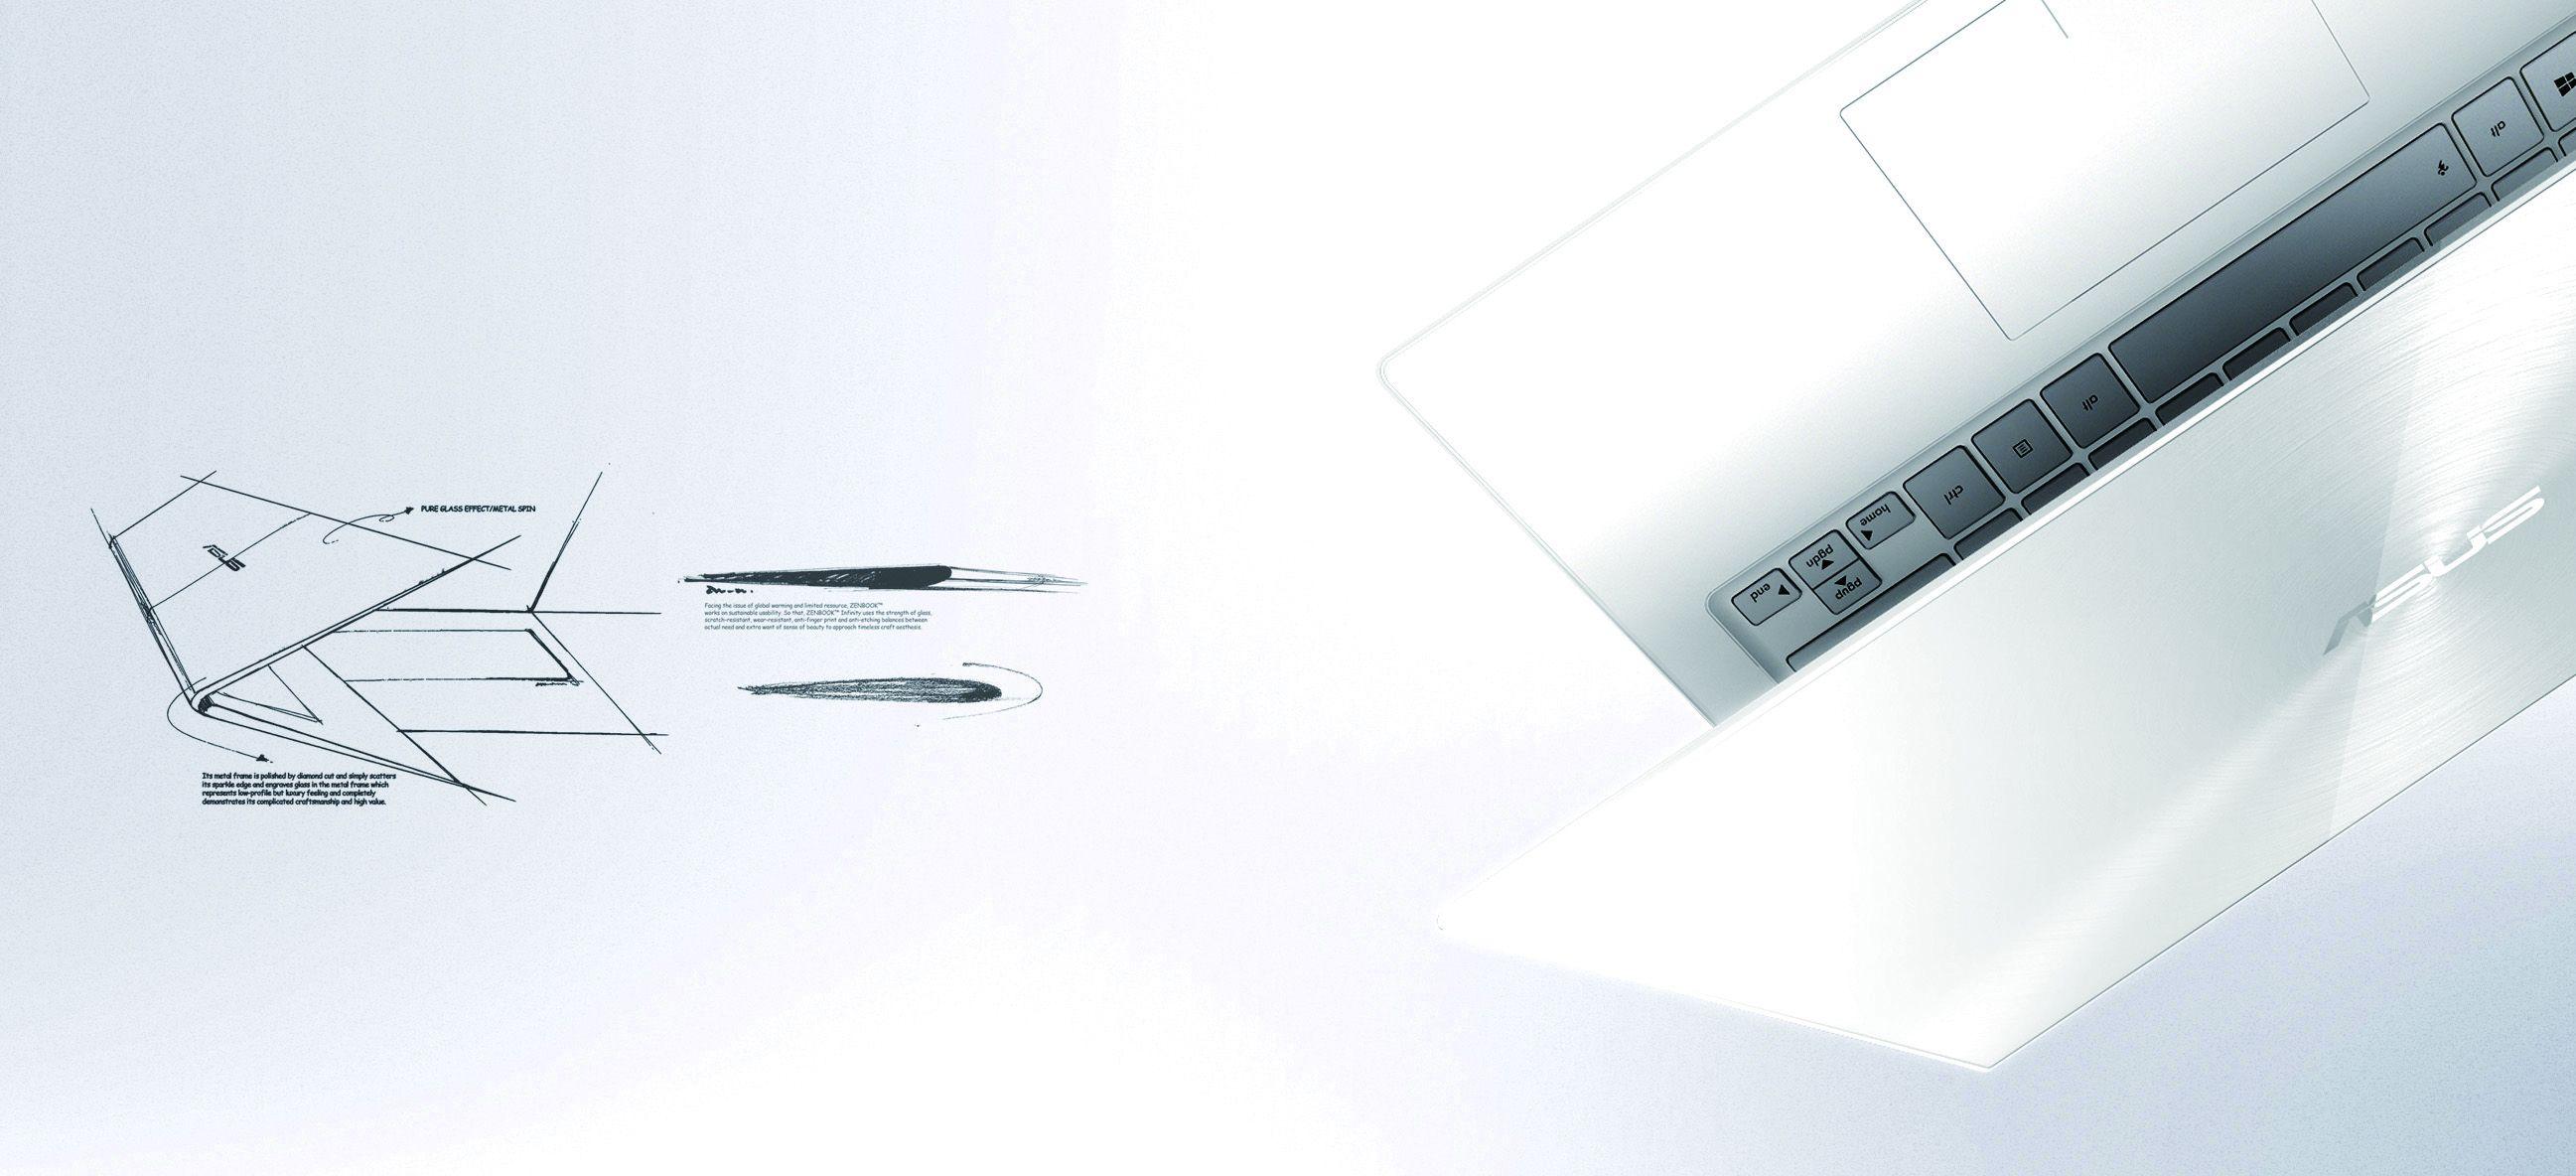 Descriere Ultrabook ASUS Zenbook UX301LA, Intel Core i7-5500U, 13.3'' QHD Touch, 8GB, 512GB SSD, Win 10 Pro, Blue